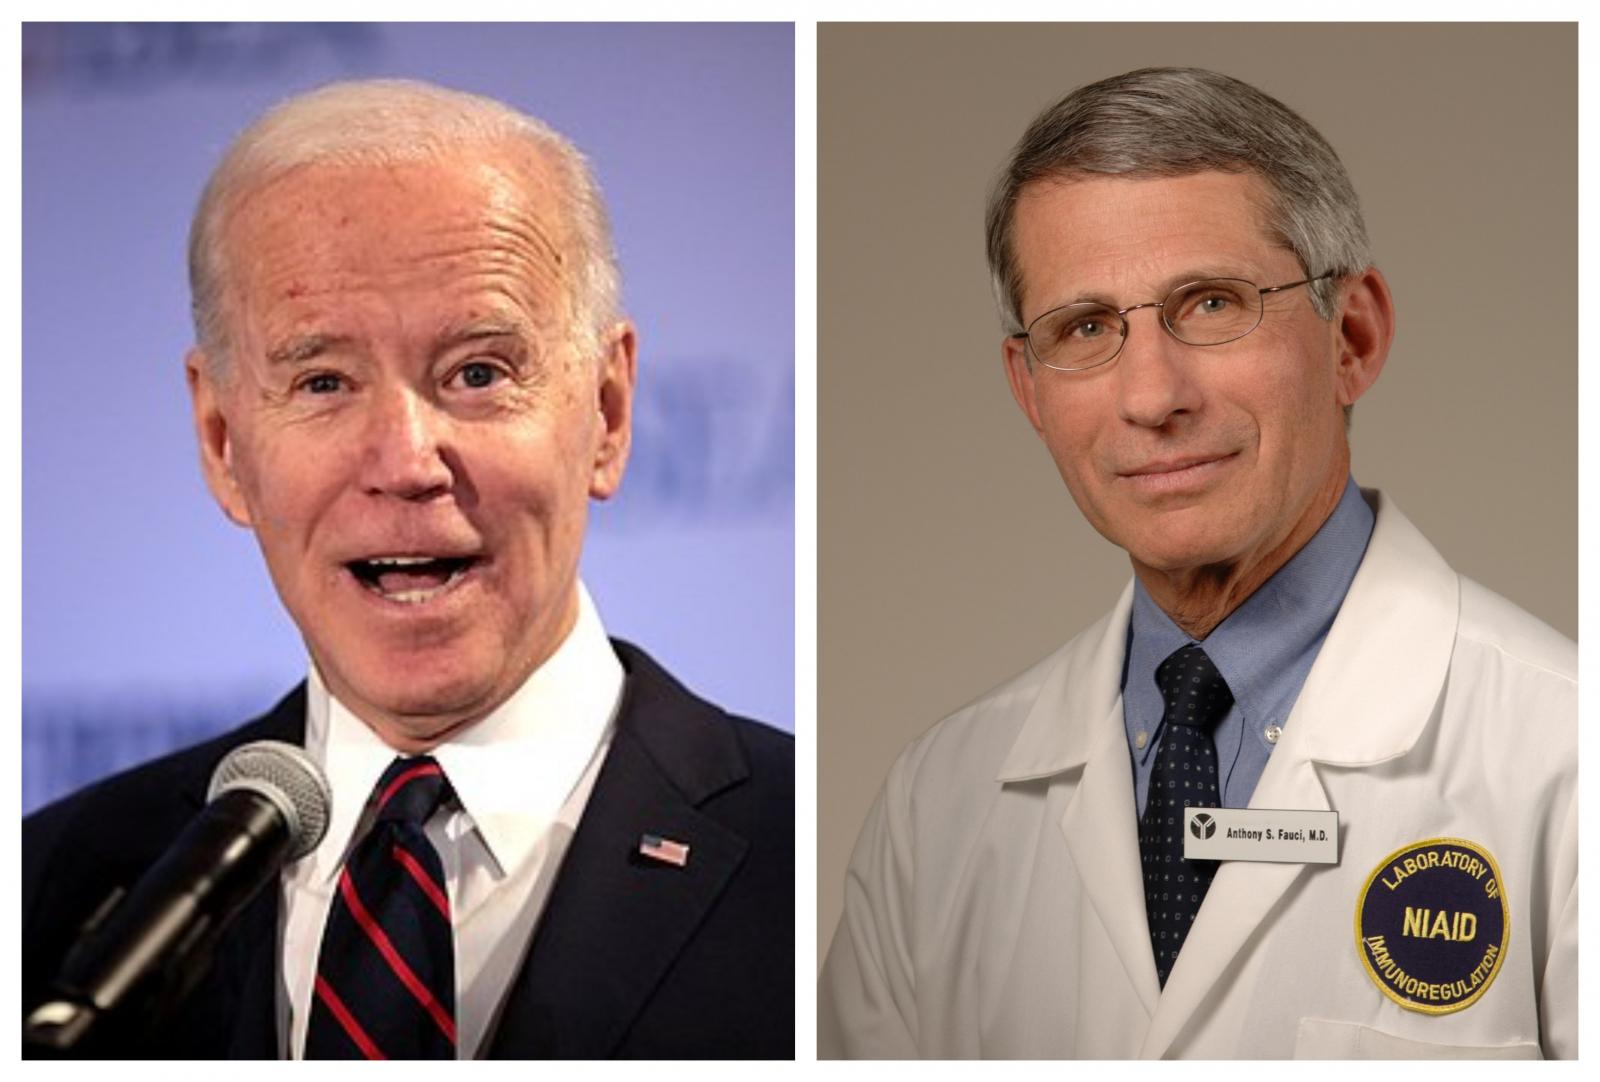 Biden Won't Seek Mandatory COVID Vaccine